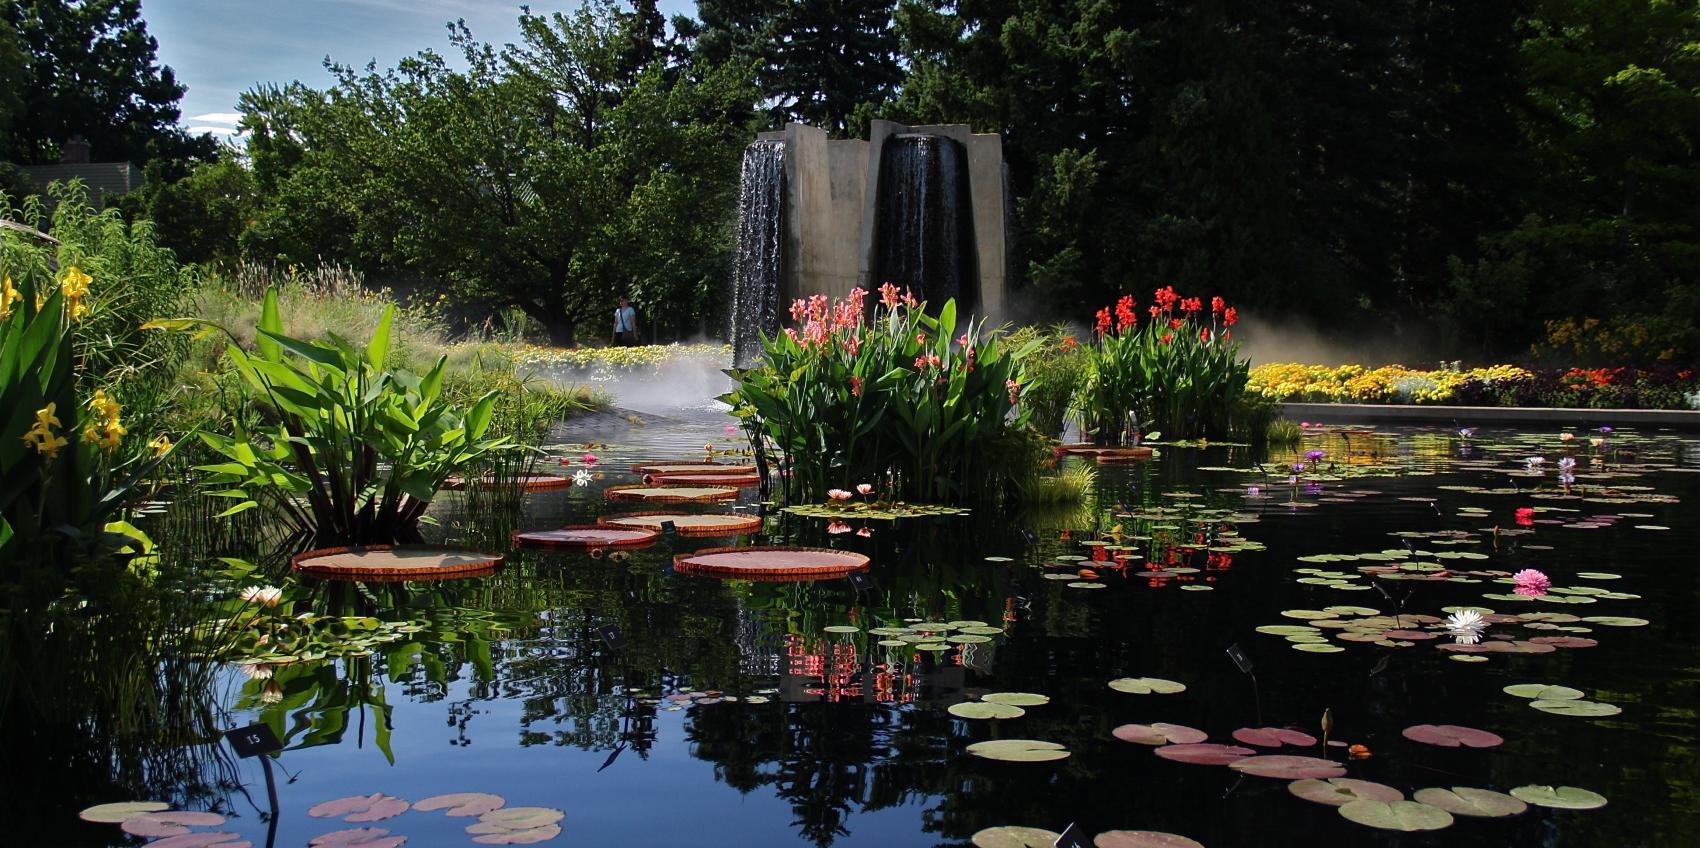 Denver Botanic Gardens American Public Gardens Association